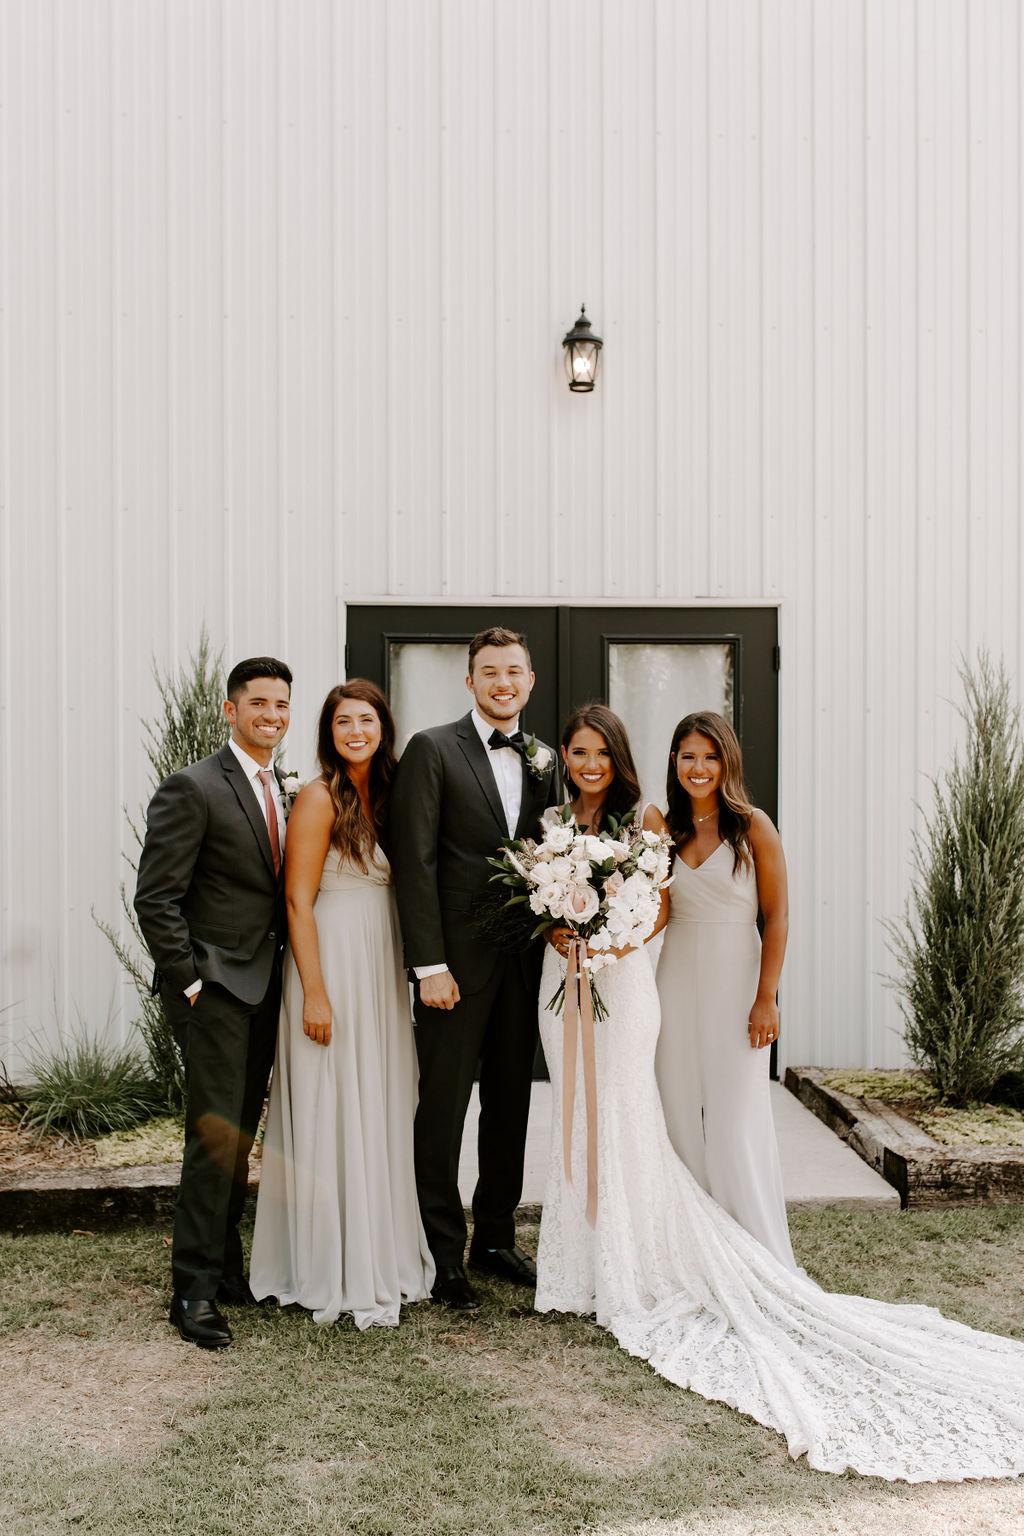 Tulsa White Barn Wedding Venue Outdoor Ceremony 49.jpg